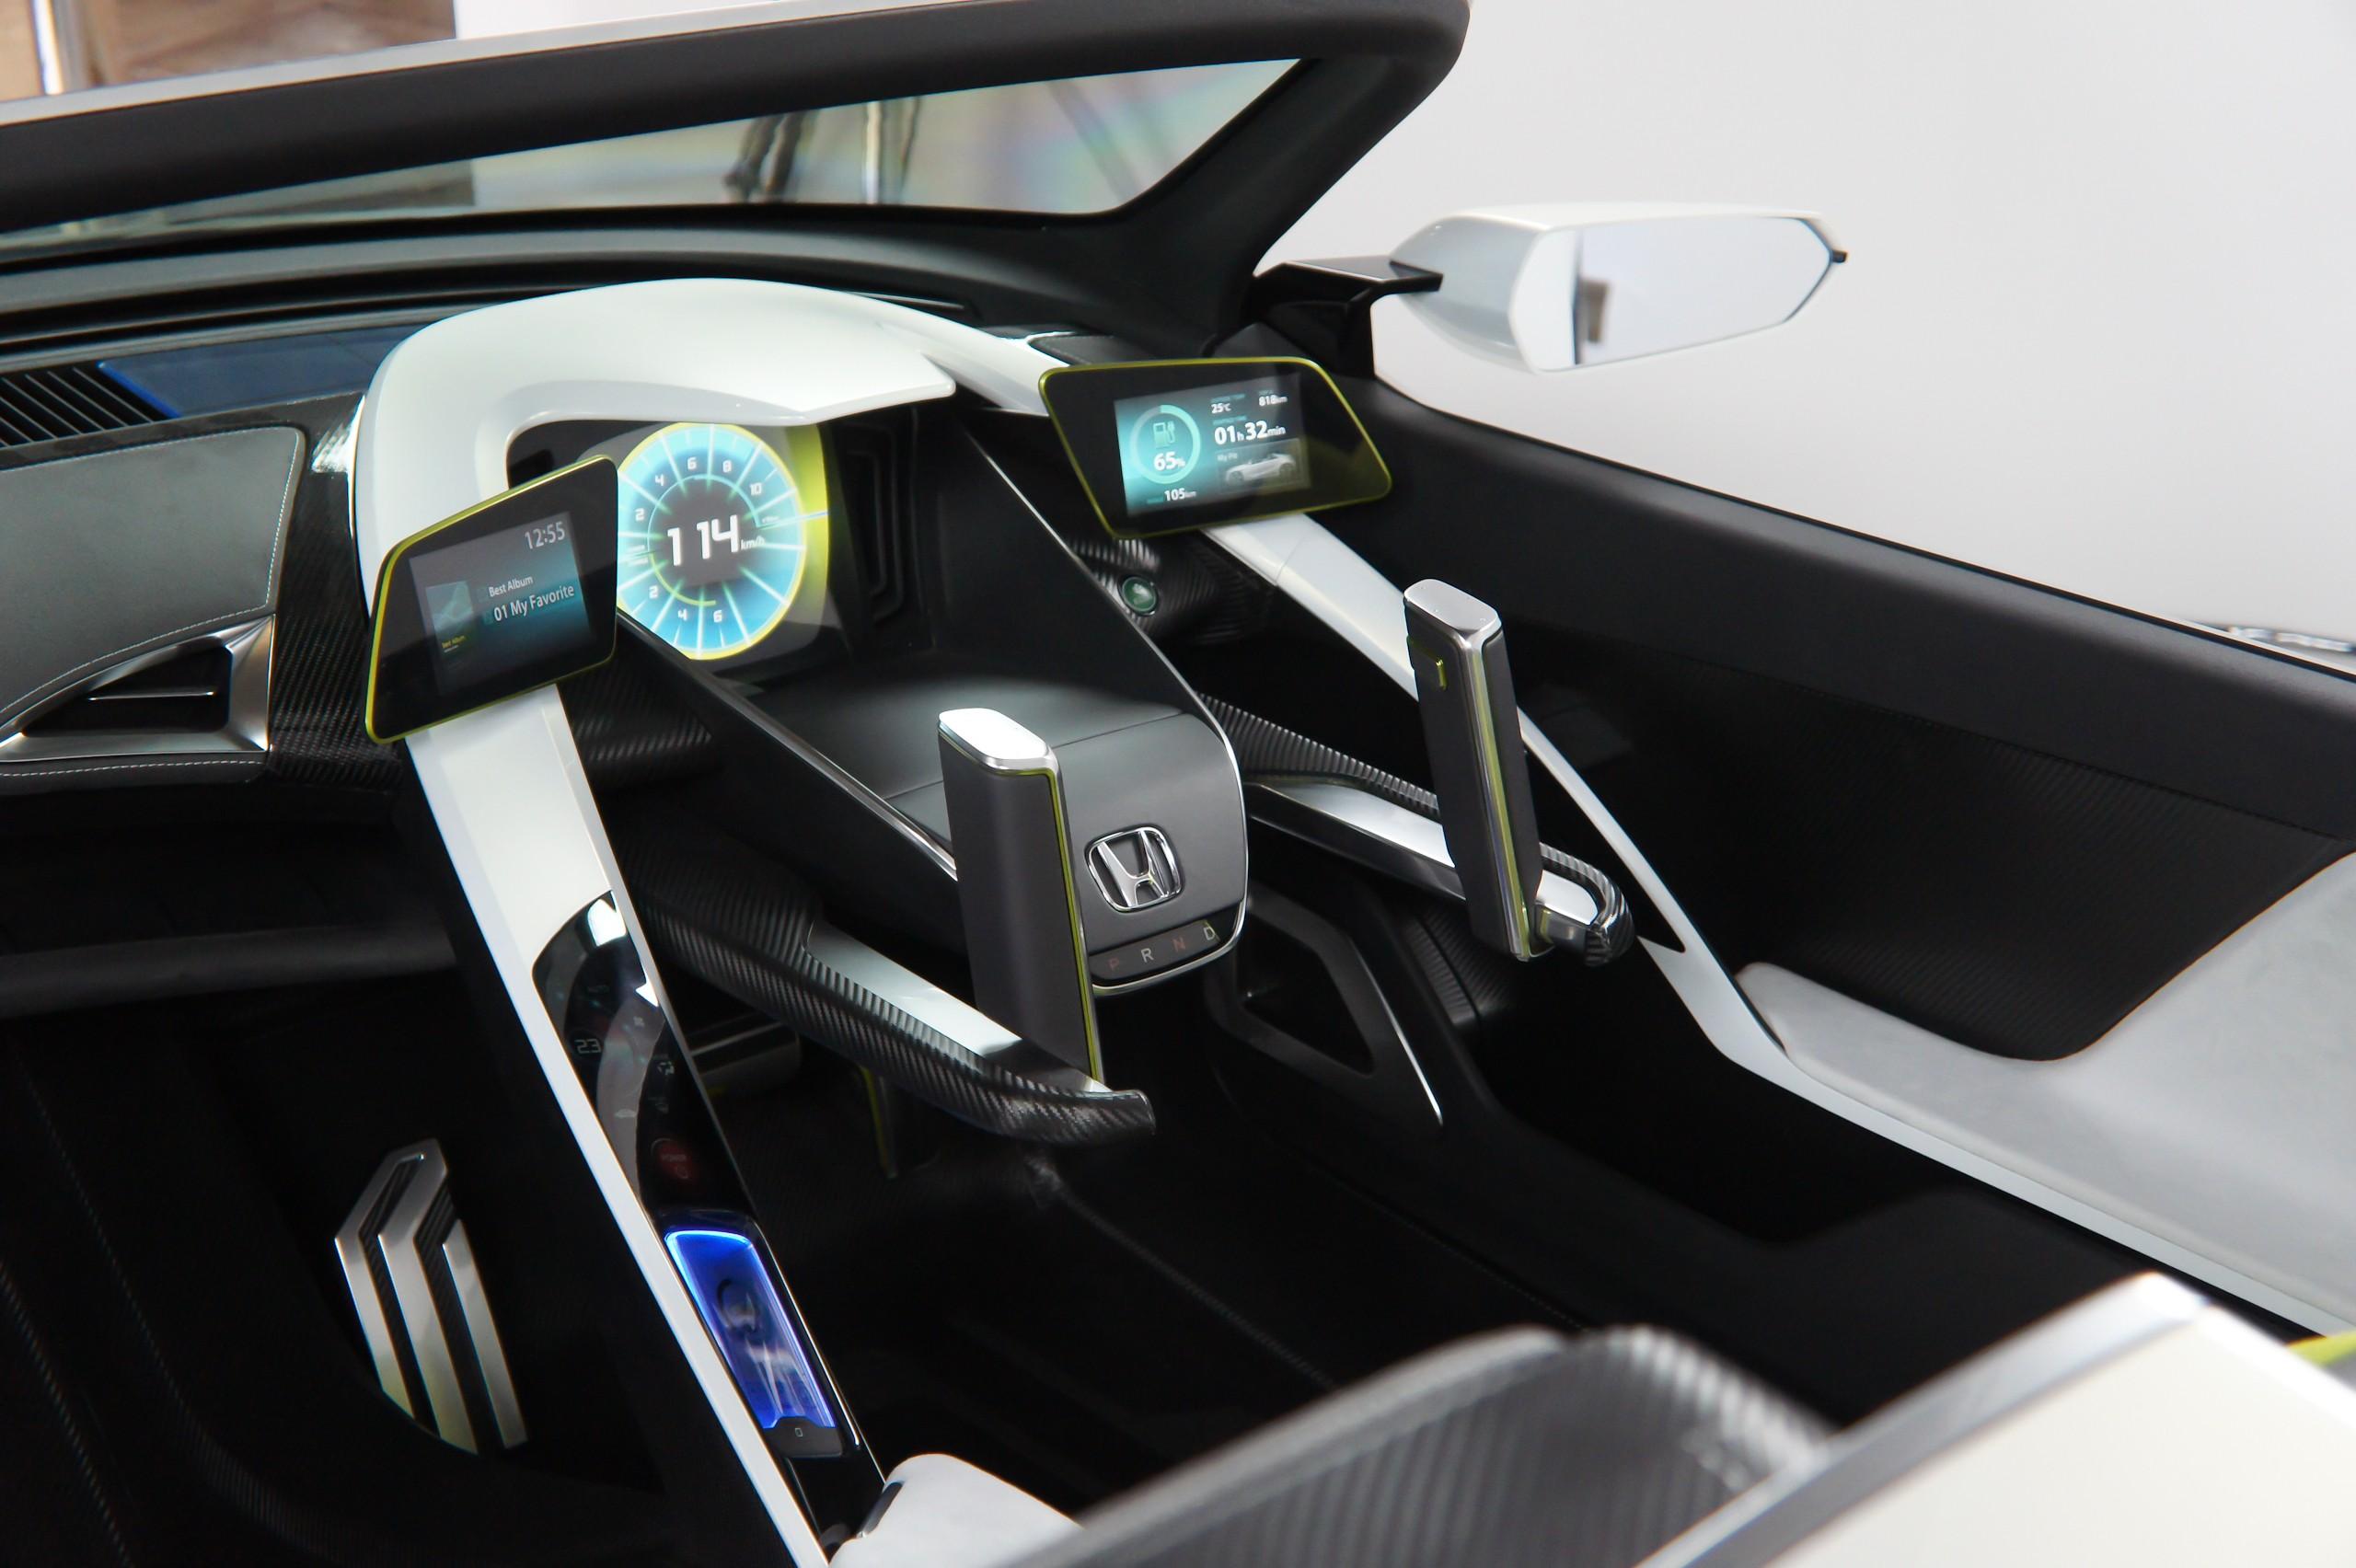 File:Honda EV-STER cockpit 2012 Tokyo Auto Salon.jpg - Wikimedia ... | {Auto cockpit 13}